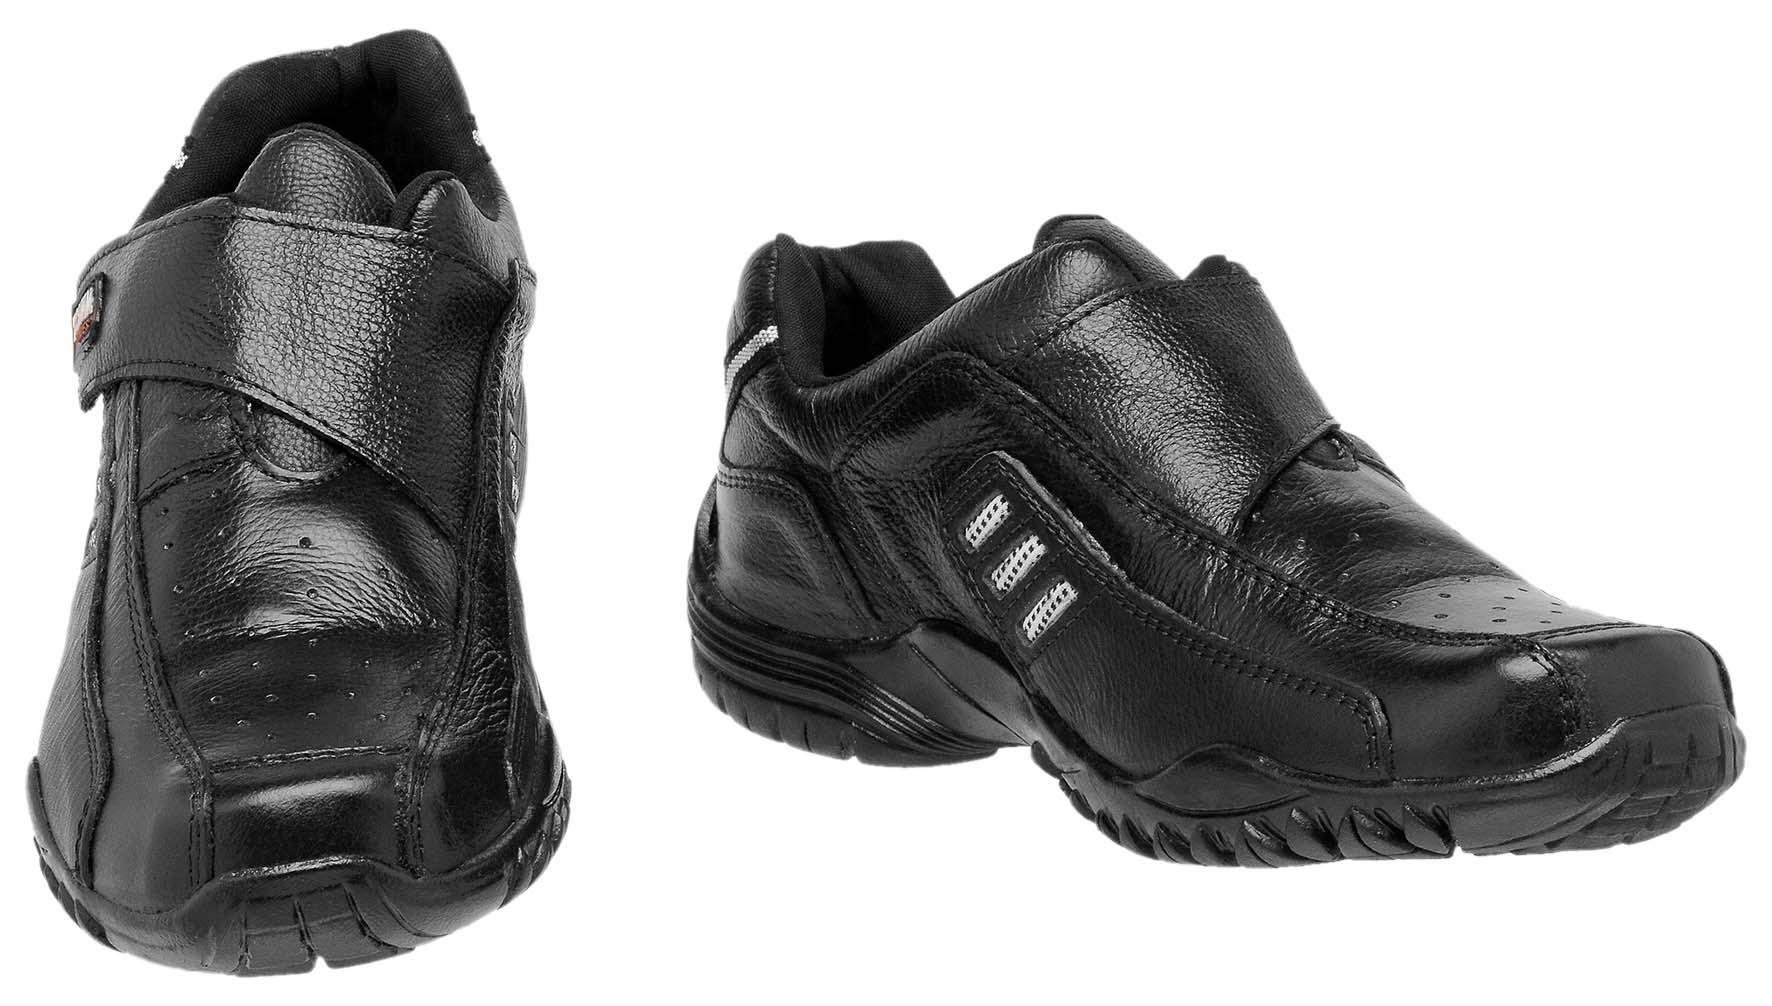 1c762b8338 ... Sapatênis Masculino Tchwm Shoes Couro Floter - Preto